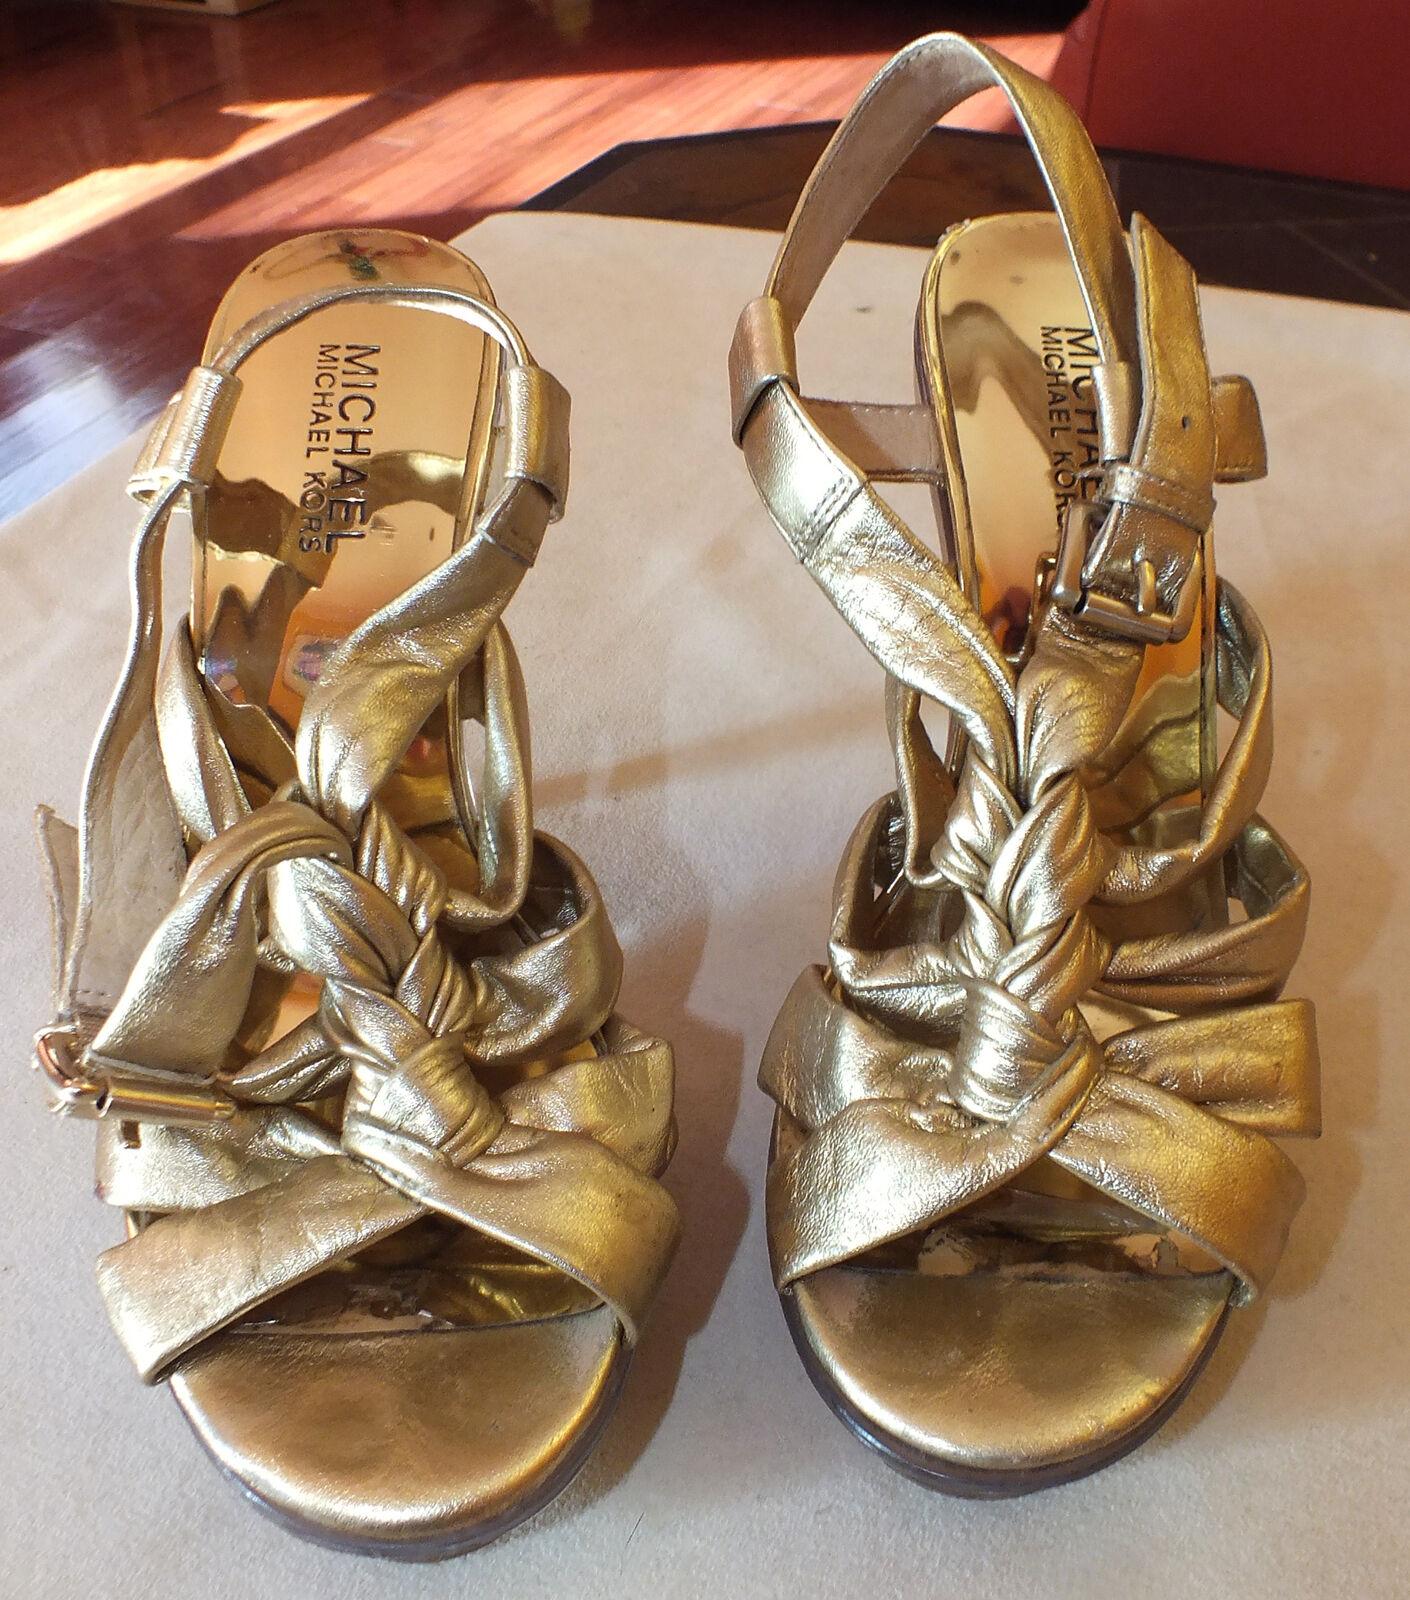 Auth Michael Kors Ladies Shoes Heels Sz. 7.5 M Used